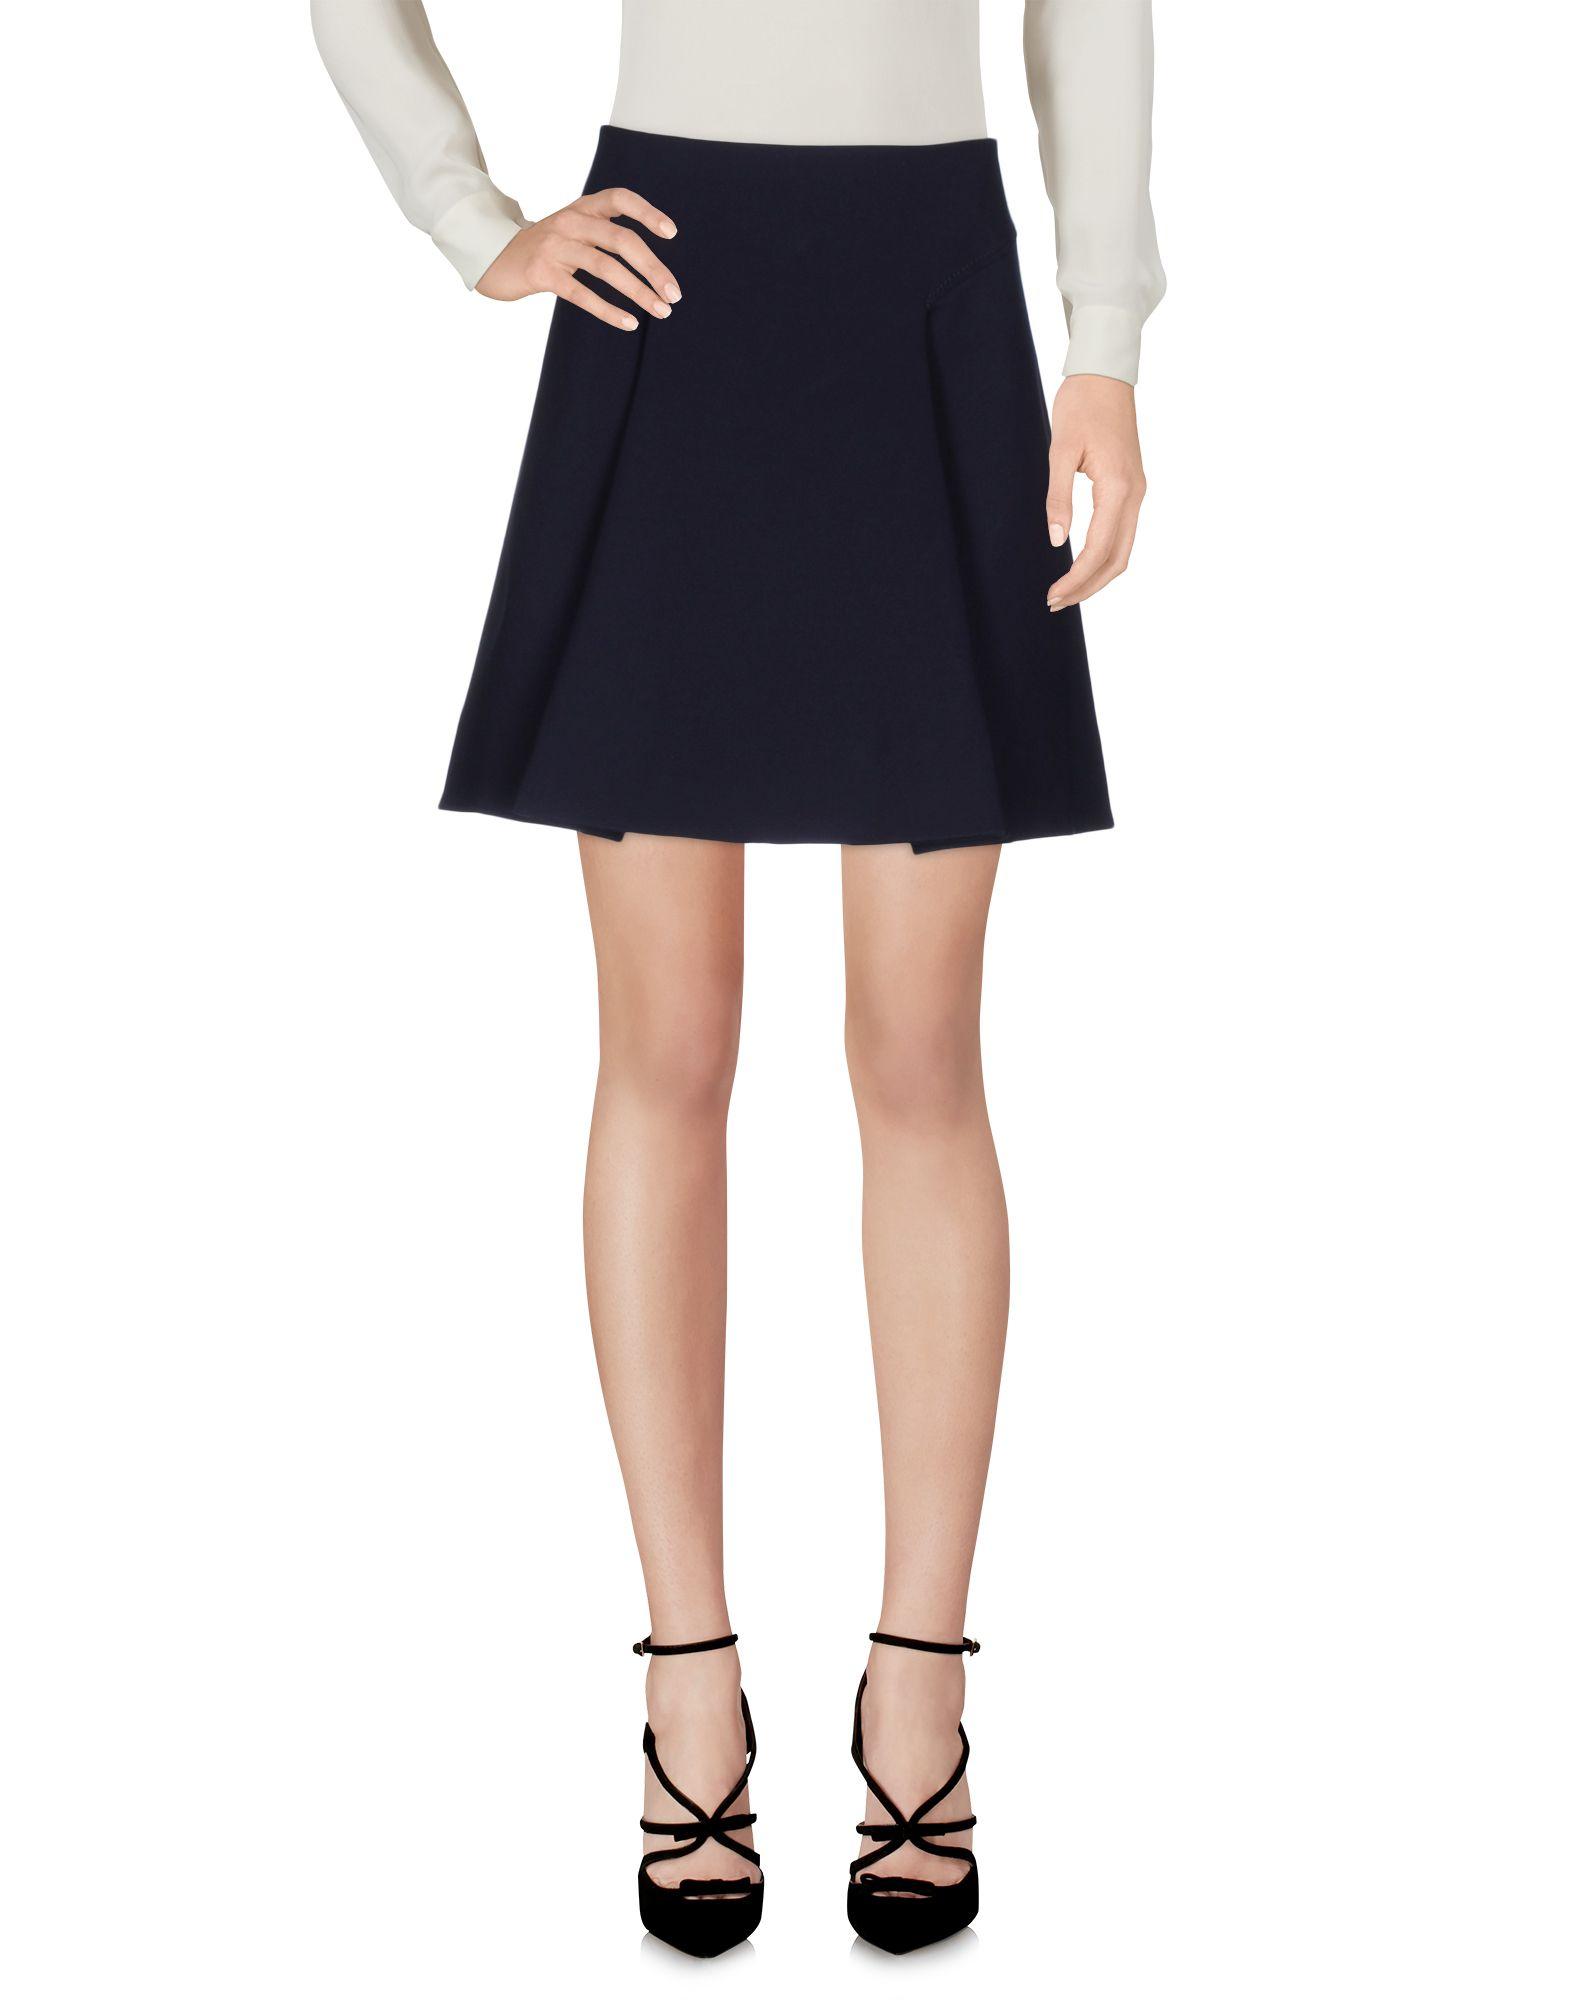 marc jacobs female marc jacobs knee length skirts